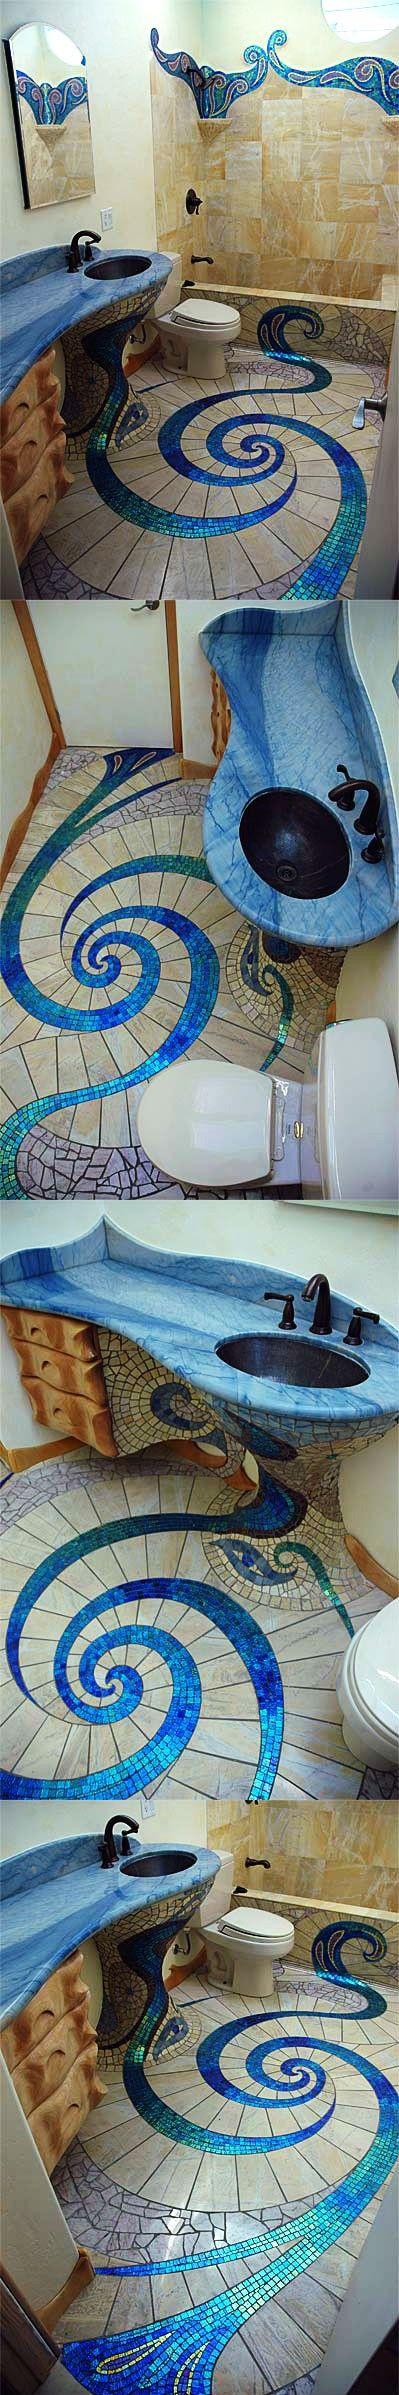 A fairy tale bathroom.  a girl had to design this,